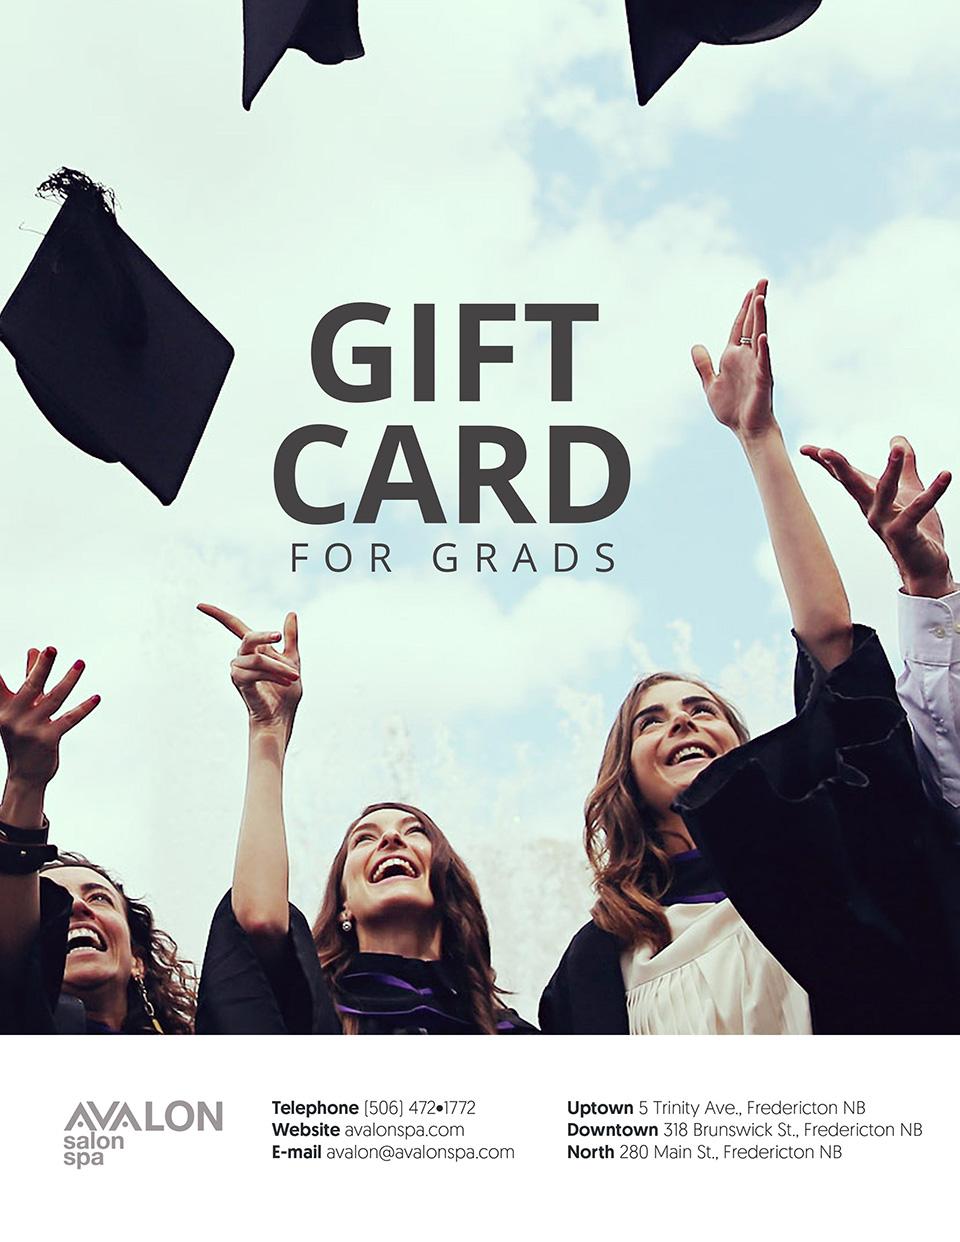 Graduates-gift-cards